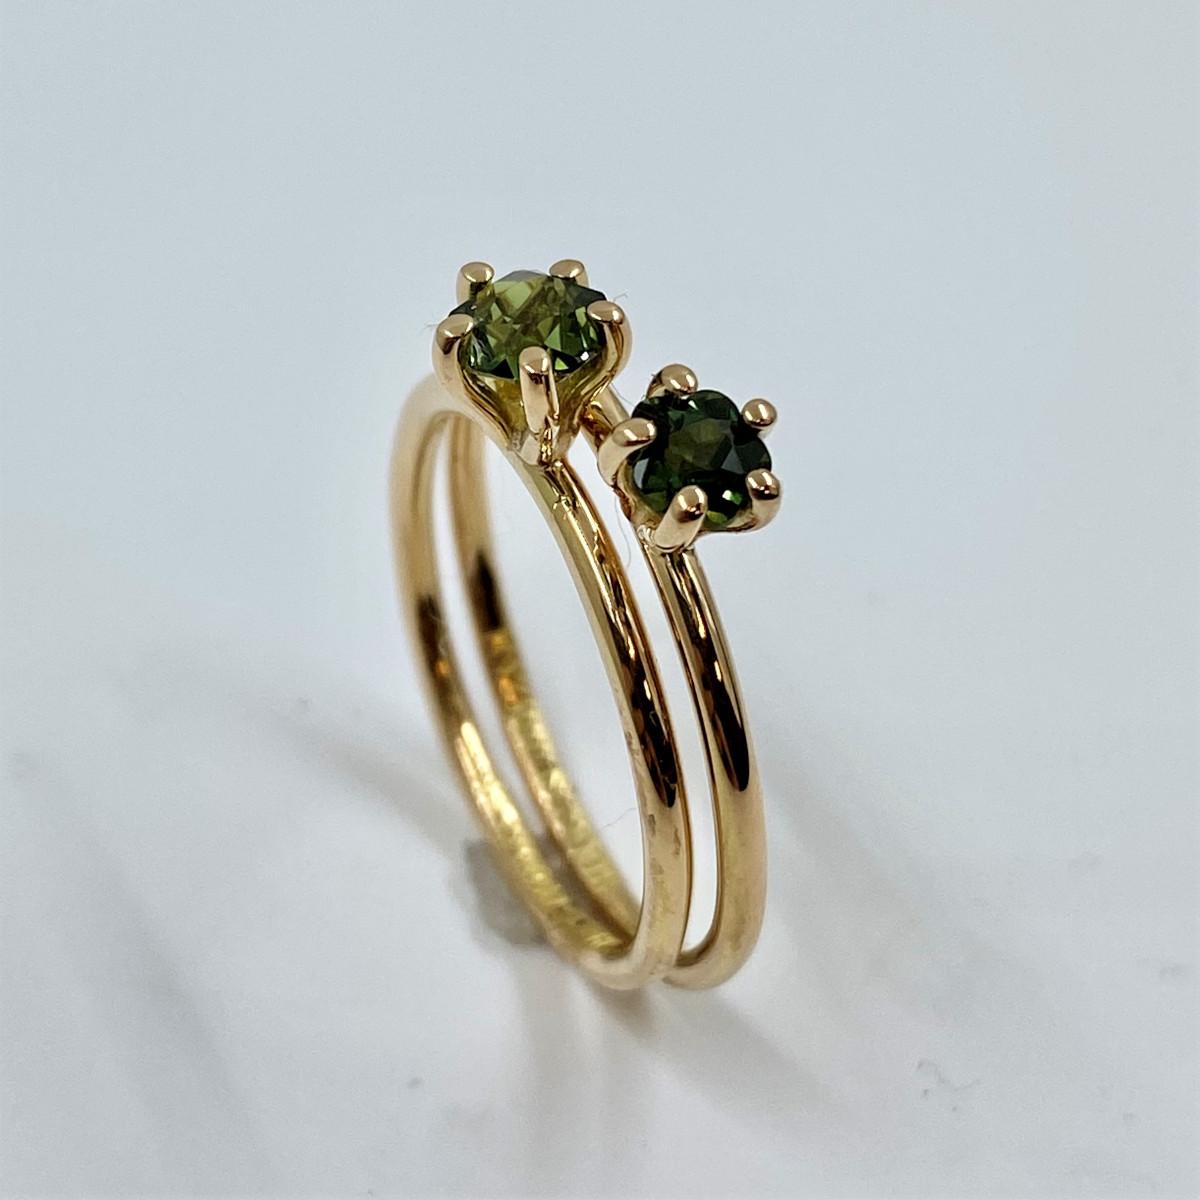 Safirring, stenring, grön ring, enstensring